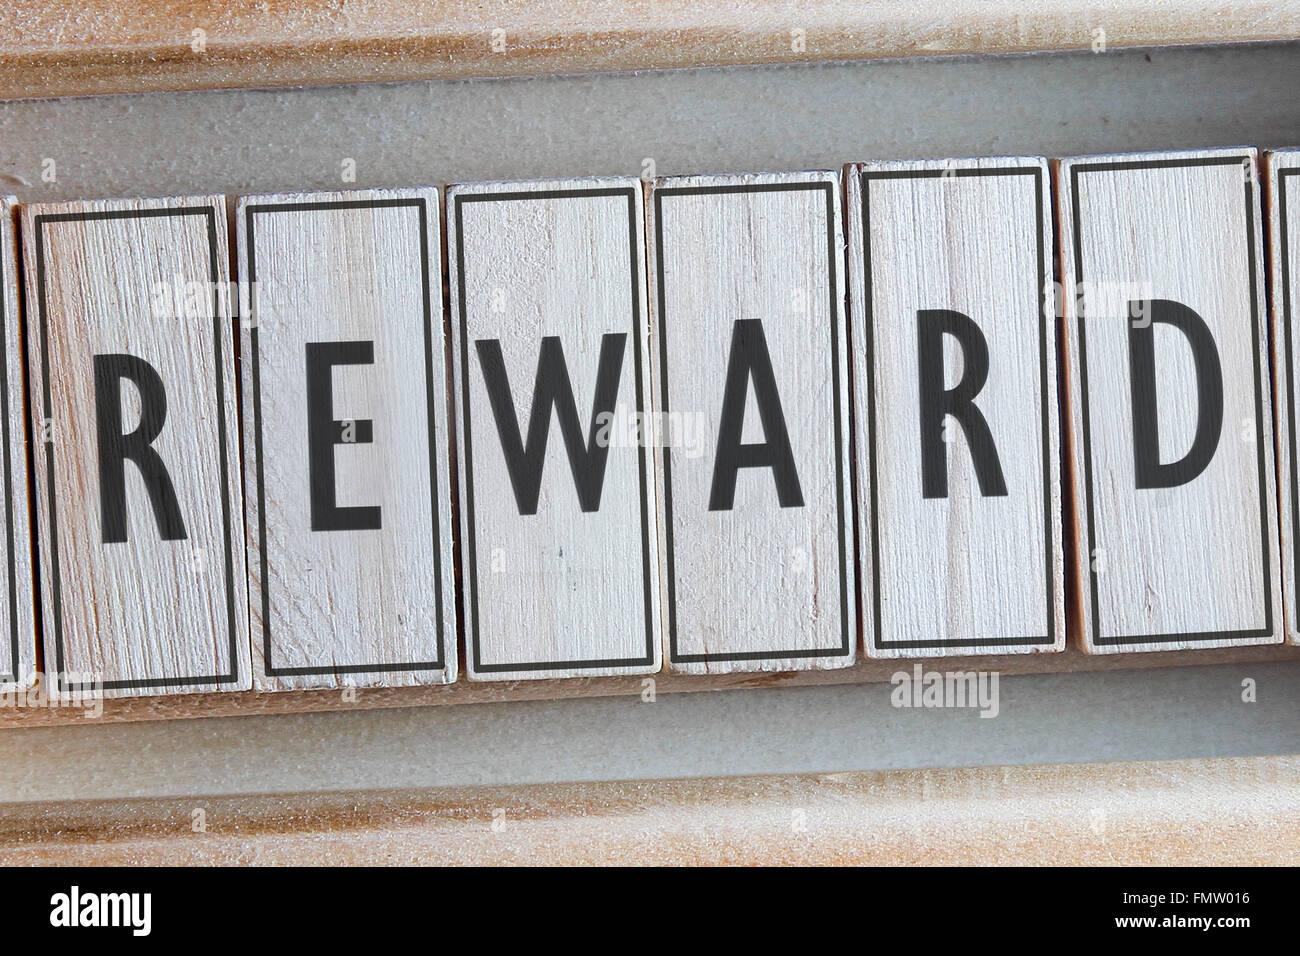 Reward word written on wood - Stock Image